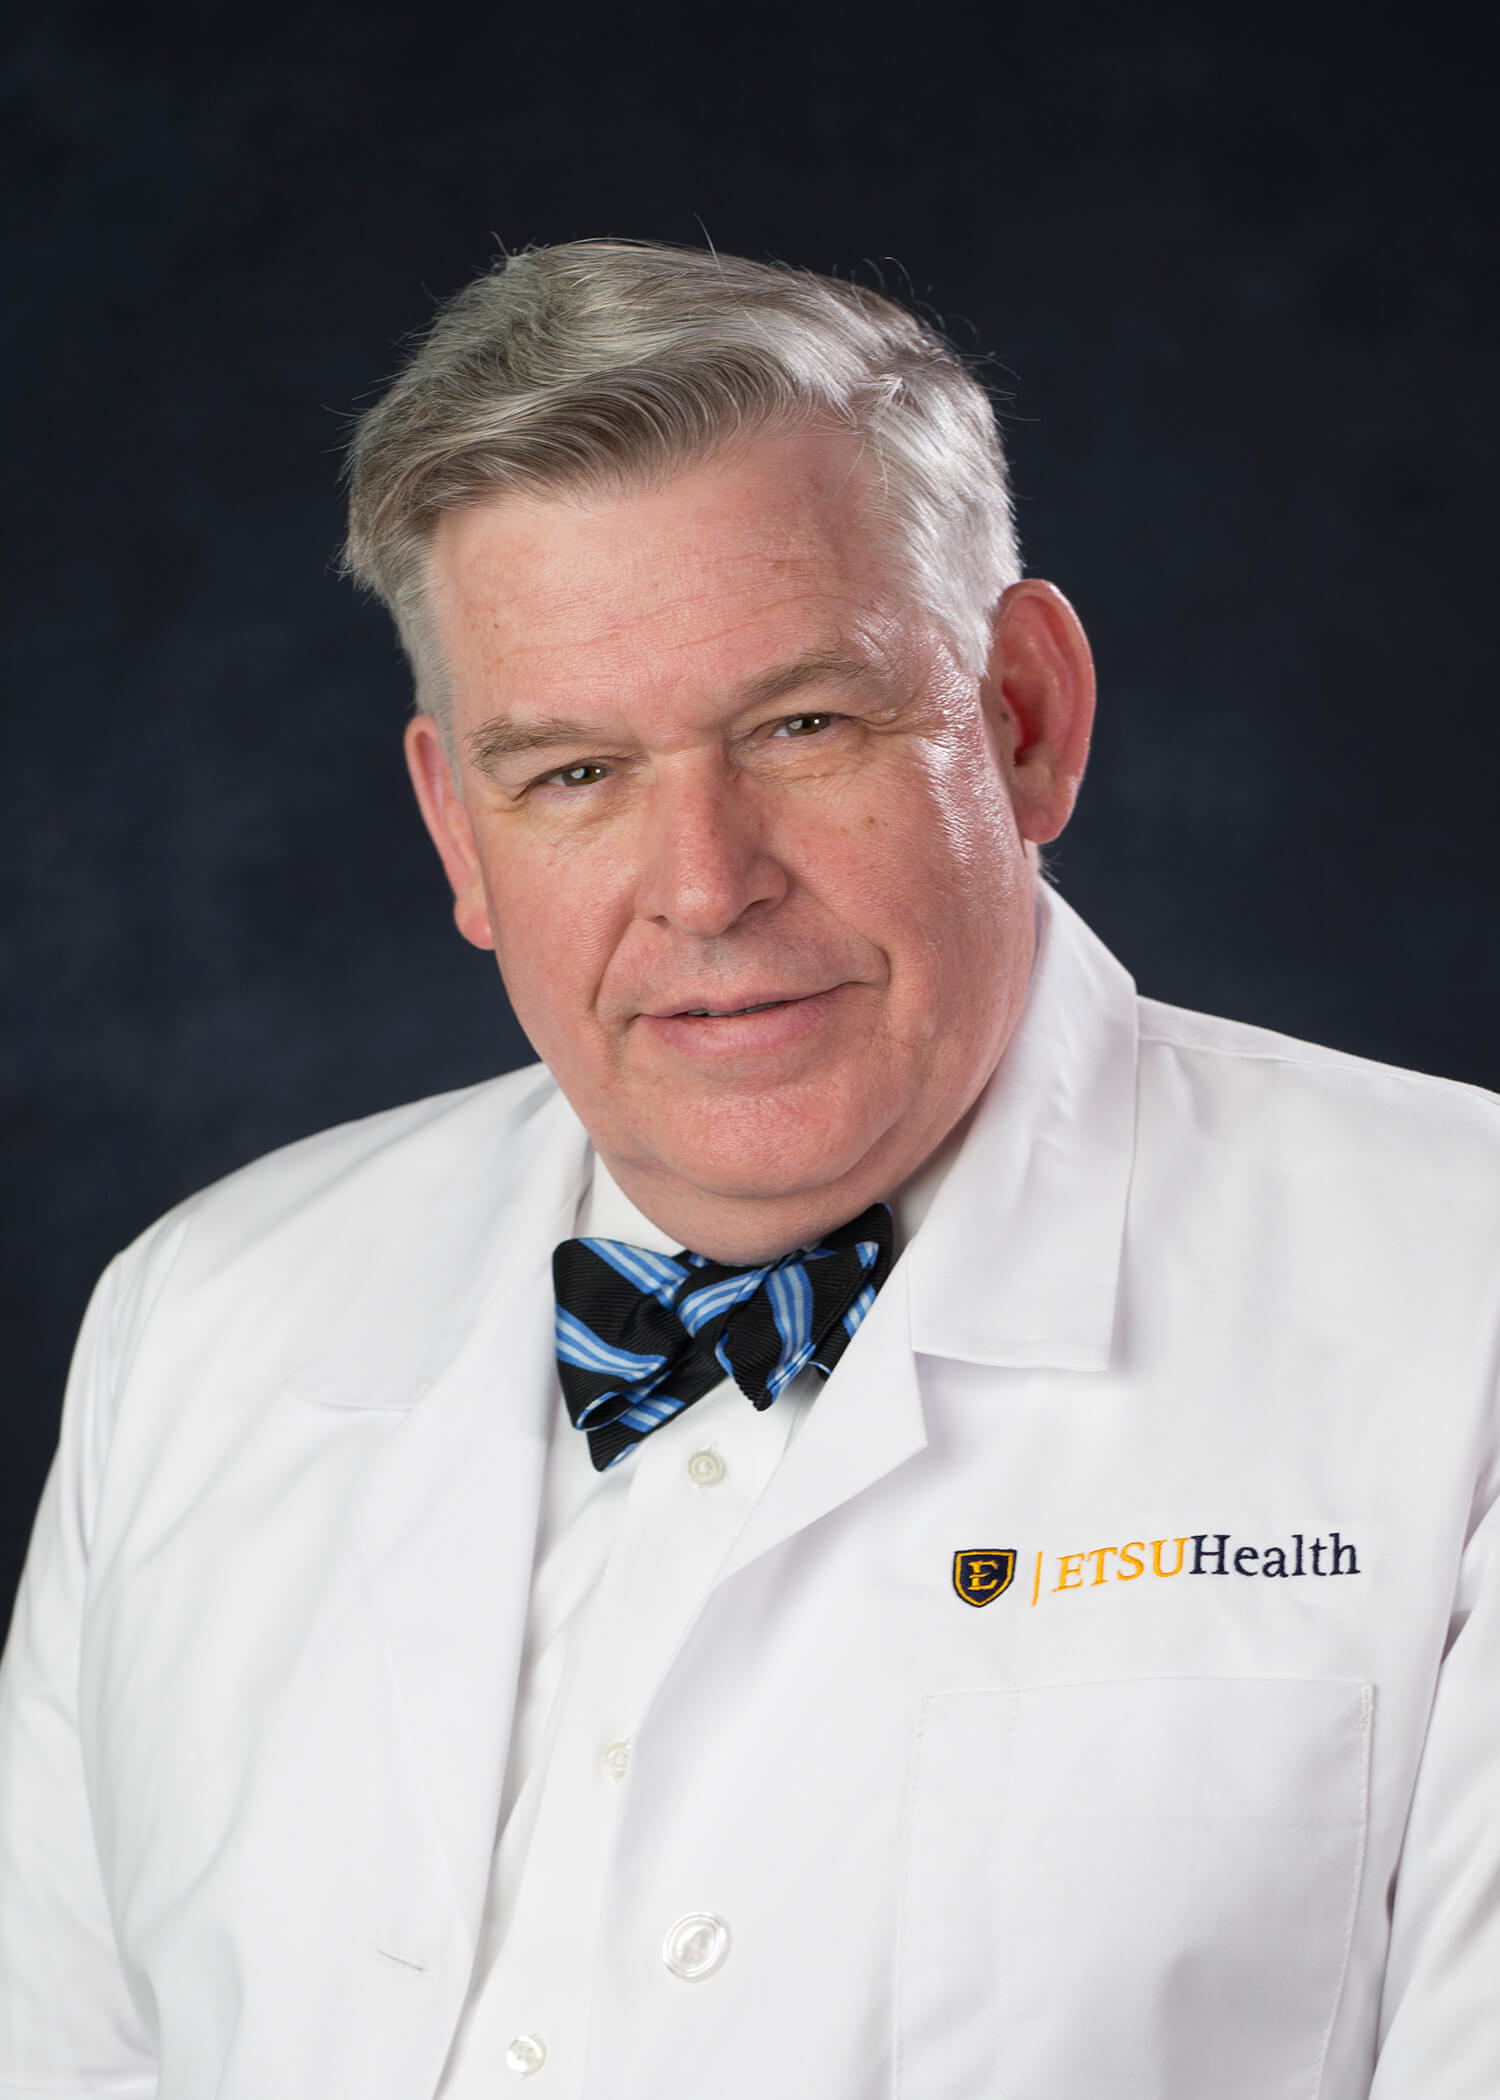 Photo of Robert Means, Jr., M.D.